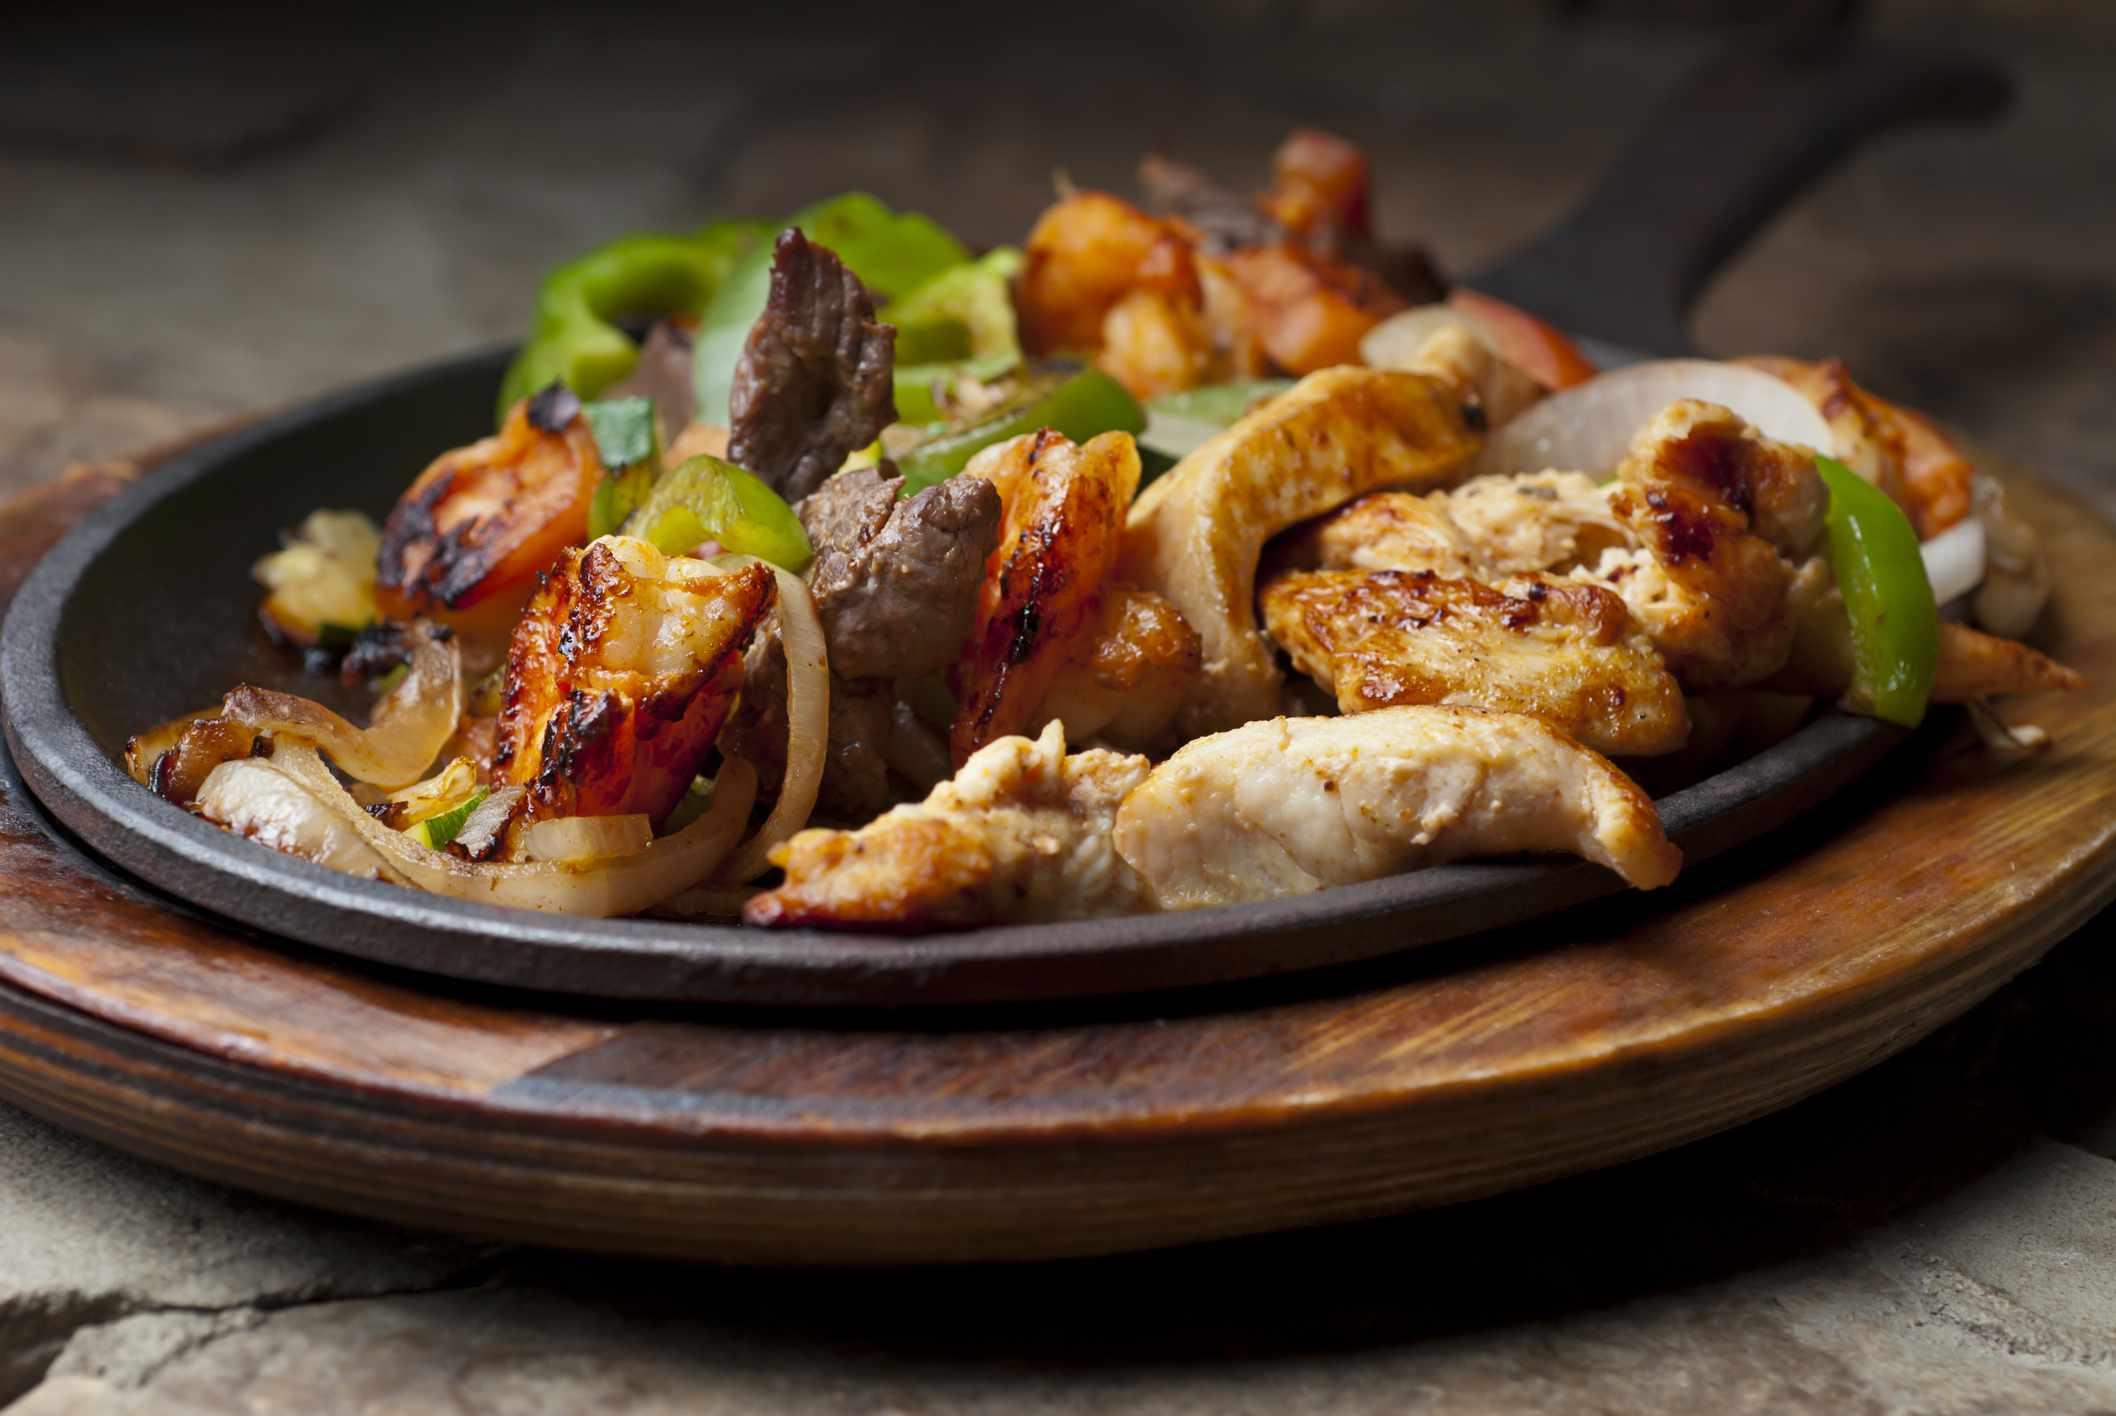 A skillet of chicken and shrimp fajitas.